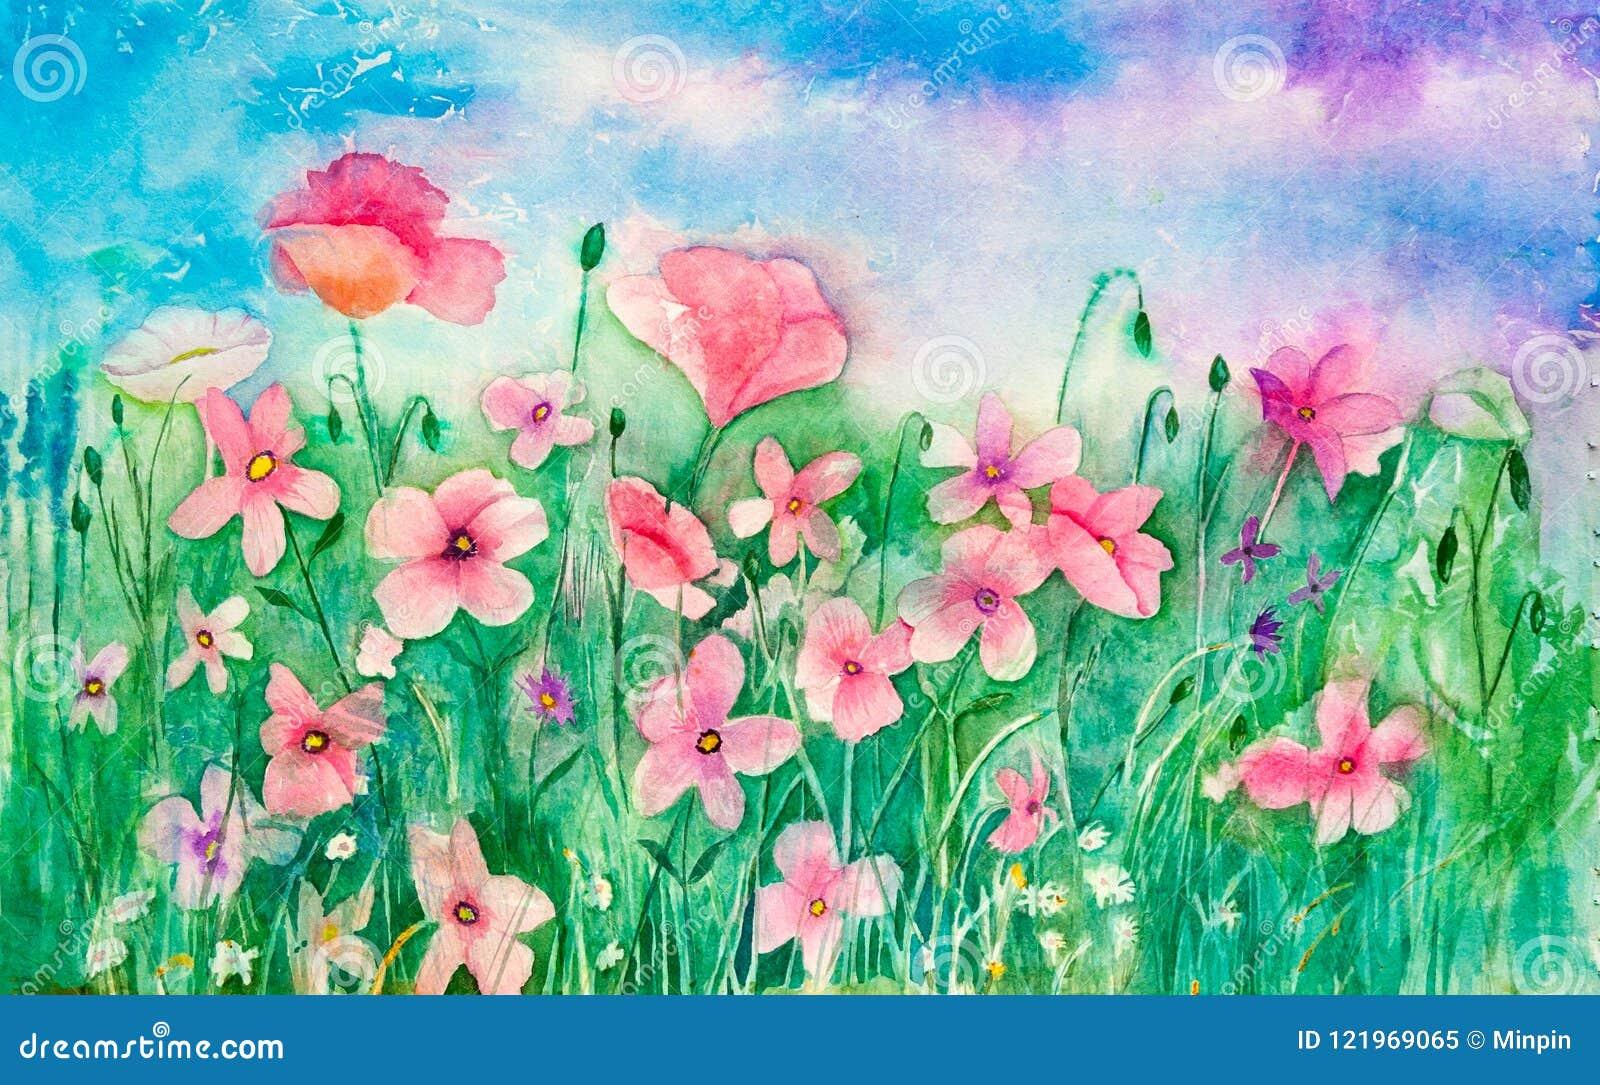 Pink Pastel Wild Flowers In A Field Original Art Stock Illustration Illustration Of Pastels Artwork 121969065